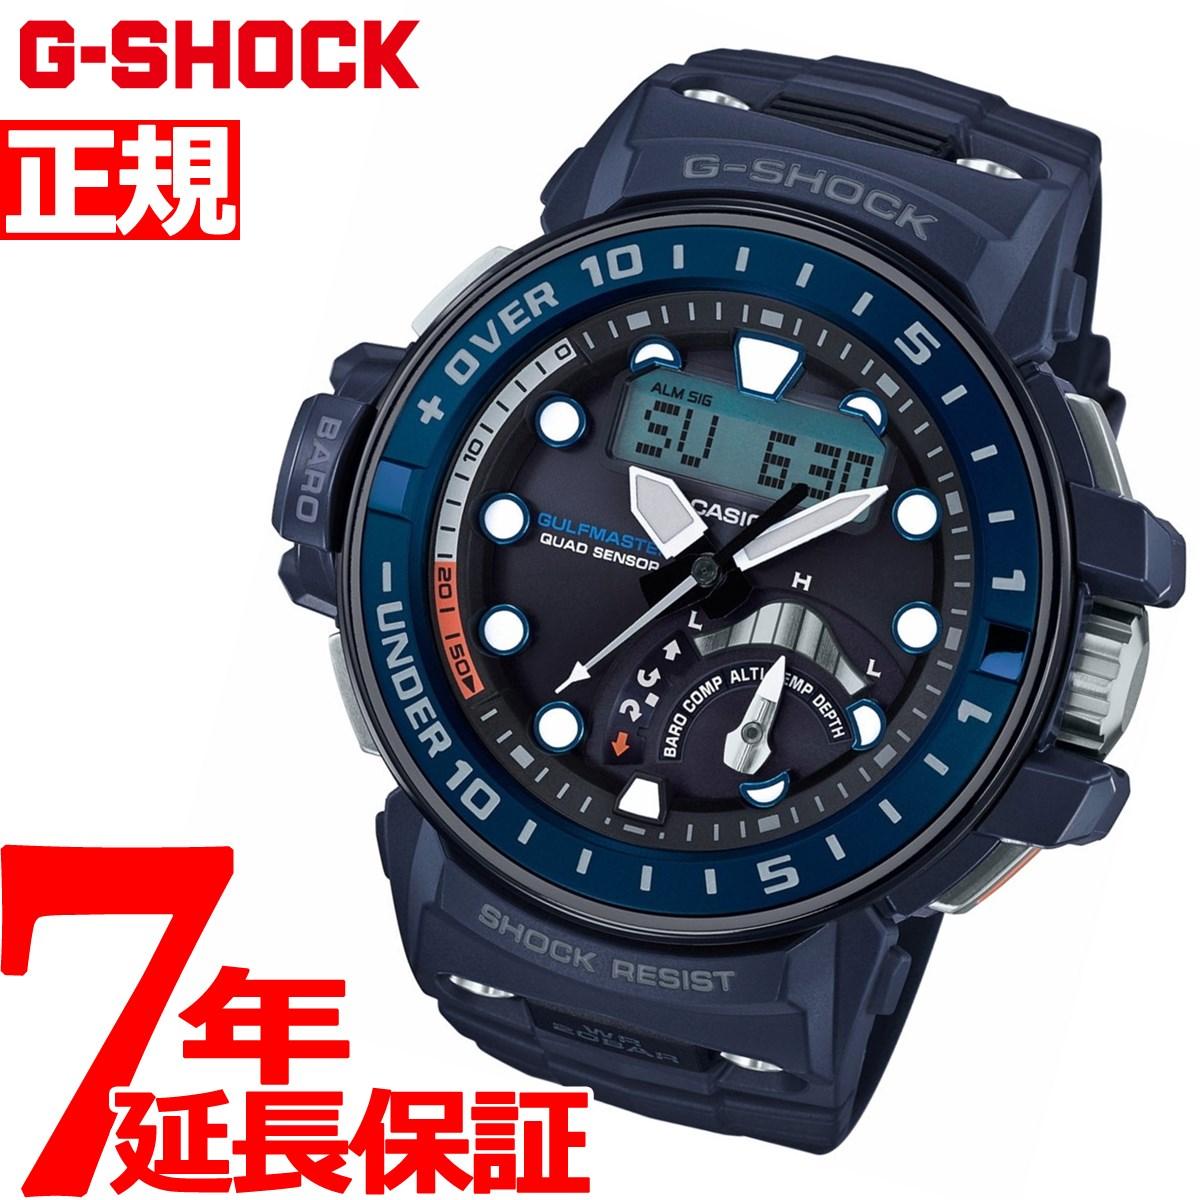 G-SHOCK 電波 ソーラー 電波時計 カシオ Gショック ガルフマスター CASIO GULFMASTER 腕時計 メンズ アナデジ GWN-Q1000A-2AJF【2018 新作】